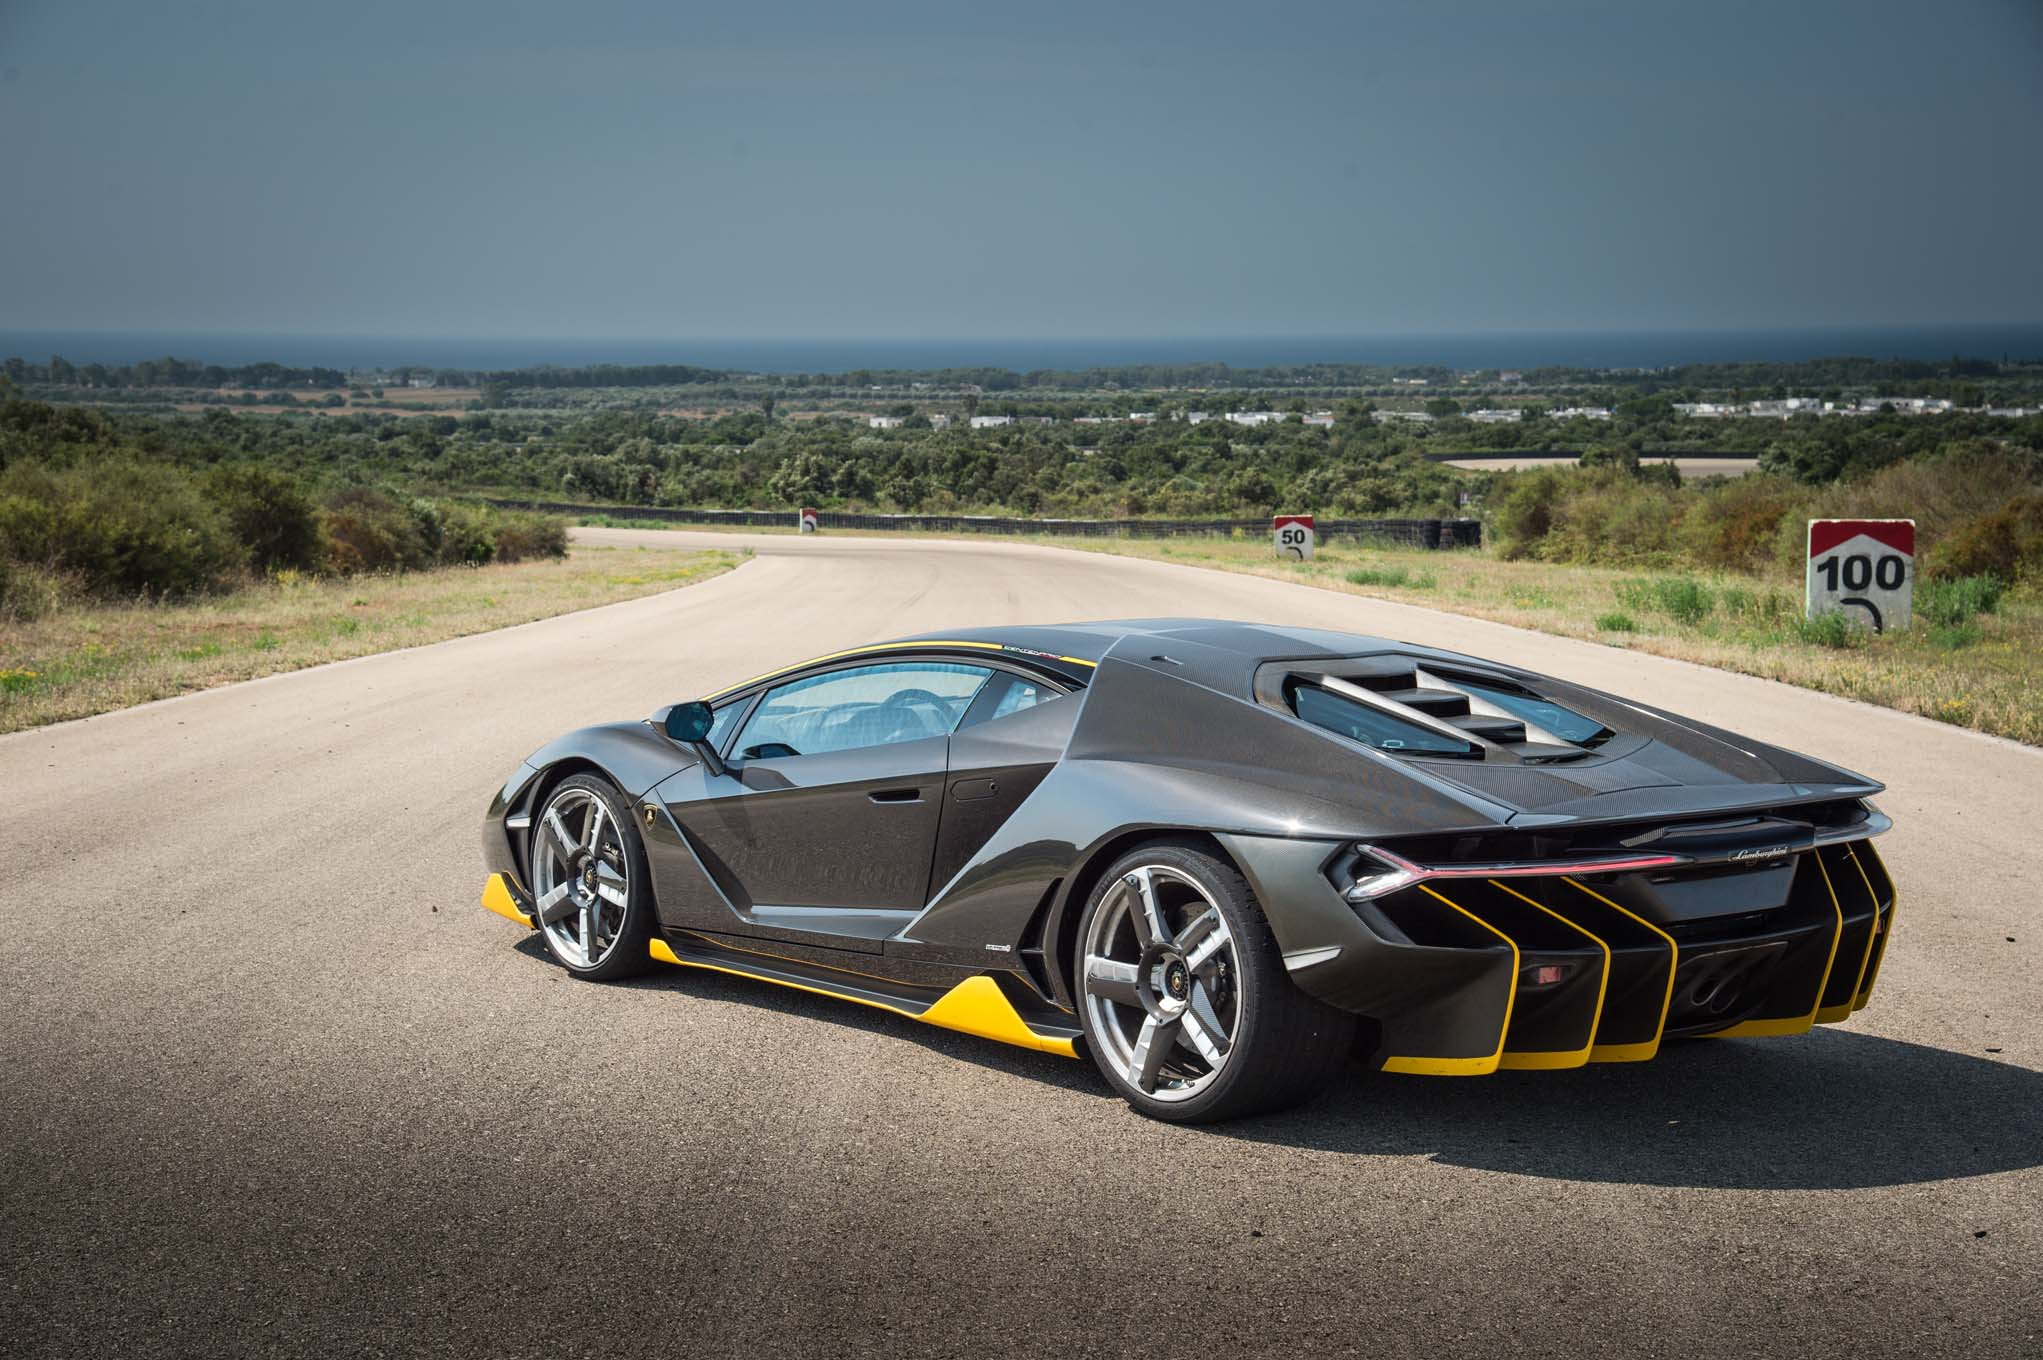 Lamborghini Centenario Roadster Confirmed For Monterey Debut